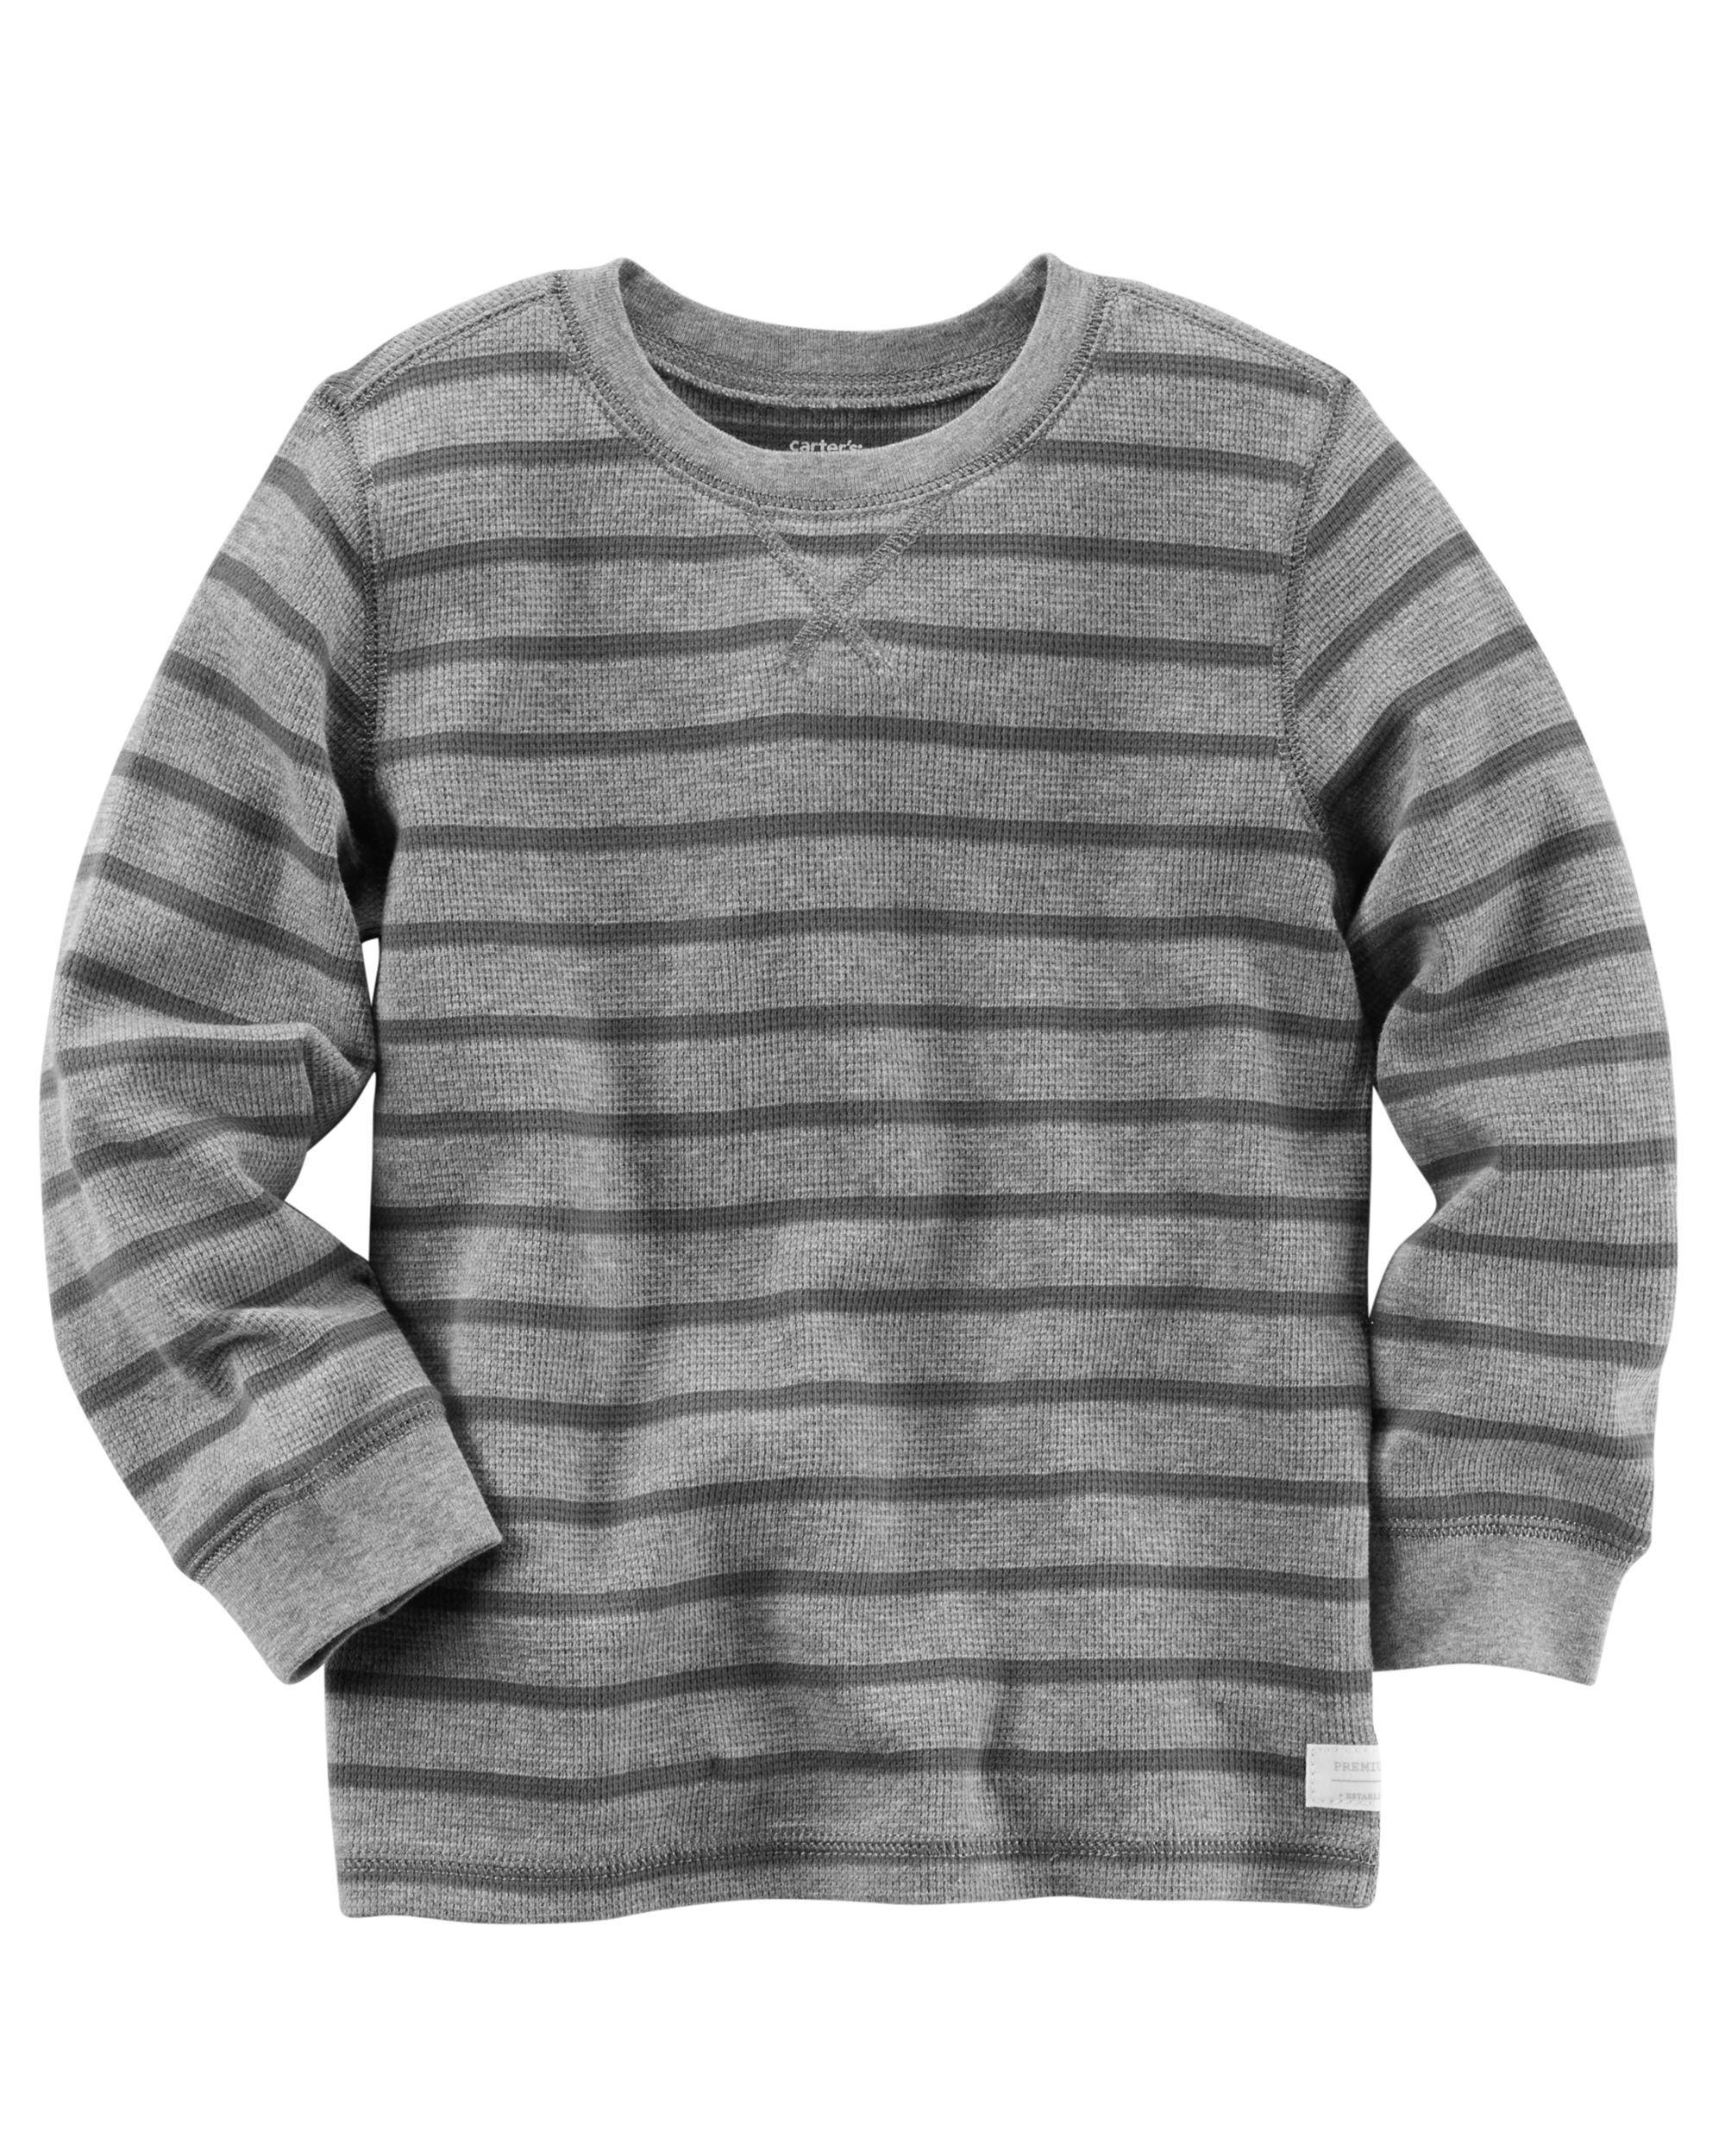 New Carter/'s Boys Gray Turtleneck Top 2T Long Sleeve Tee Shirt